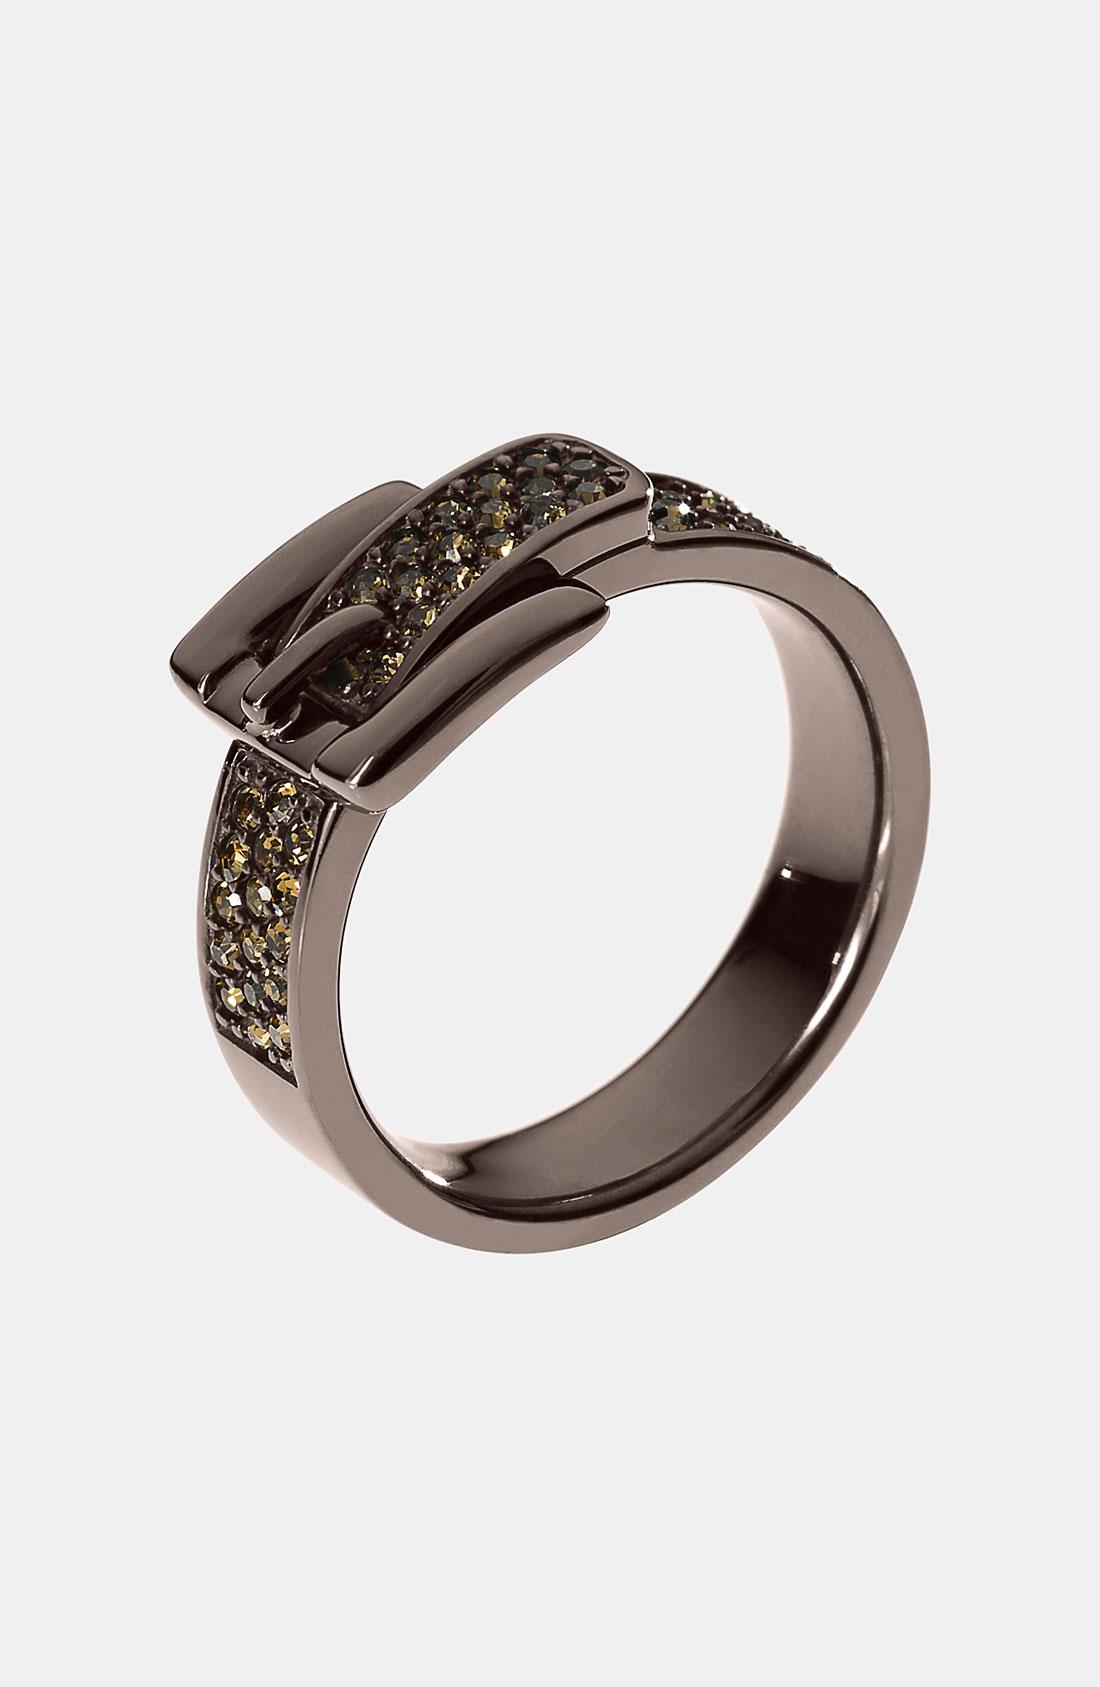 michael michael kors buckle ring in silver espresso multi. Black Bedroom Furniture Sets. Home Design Ideas